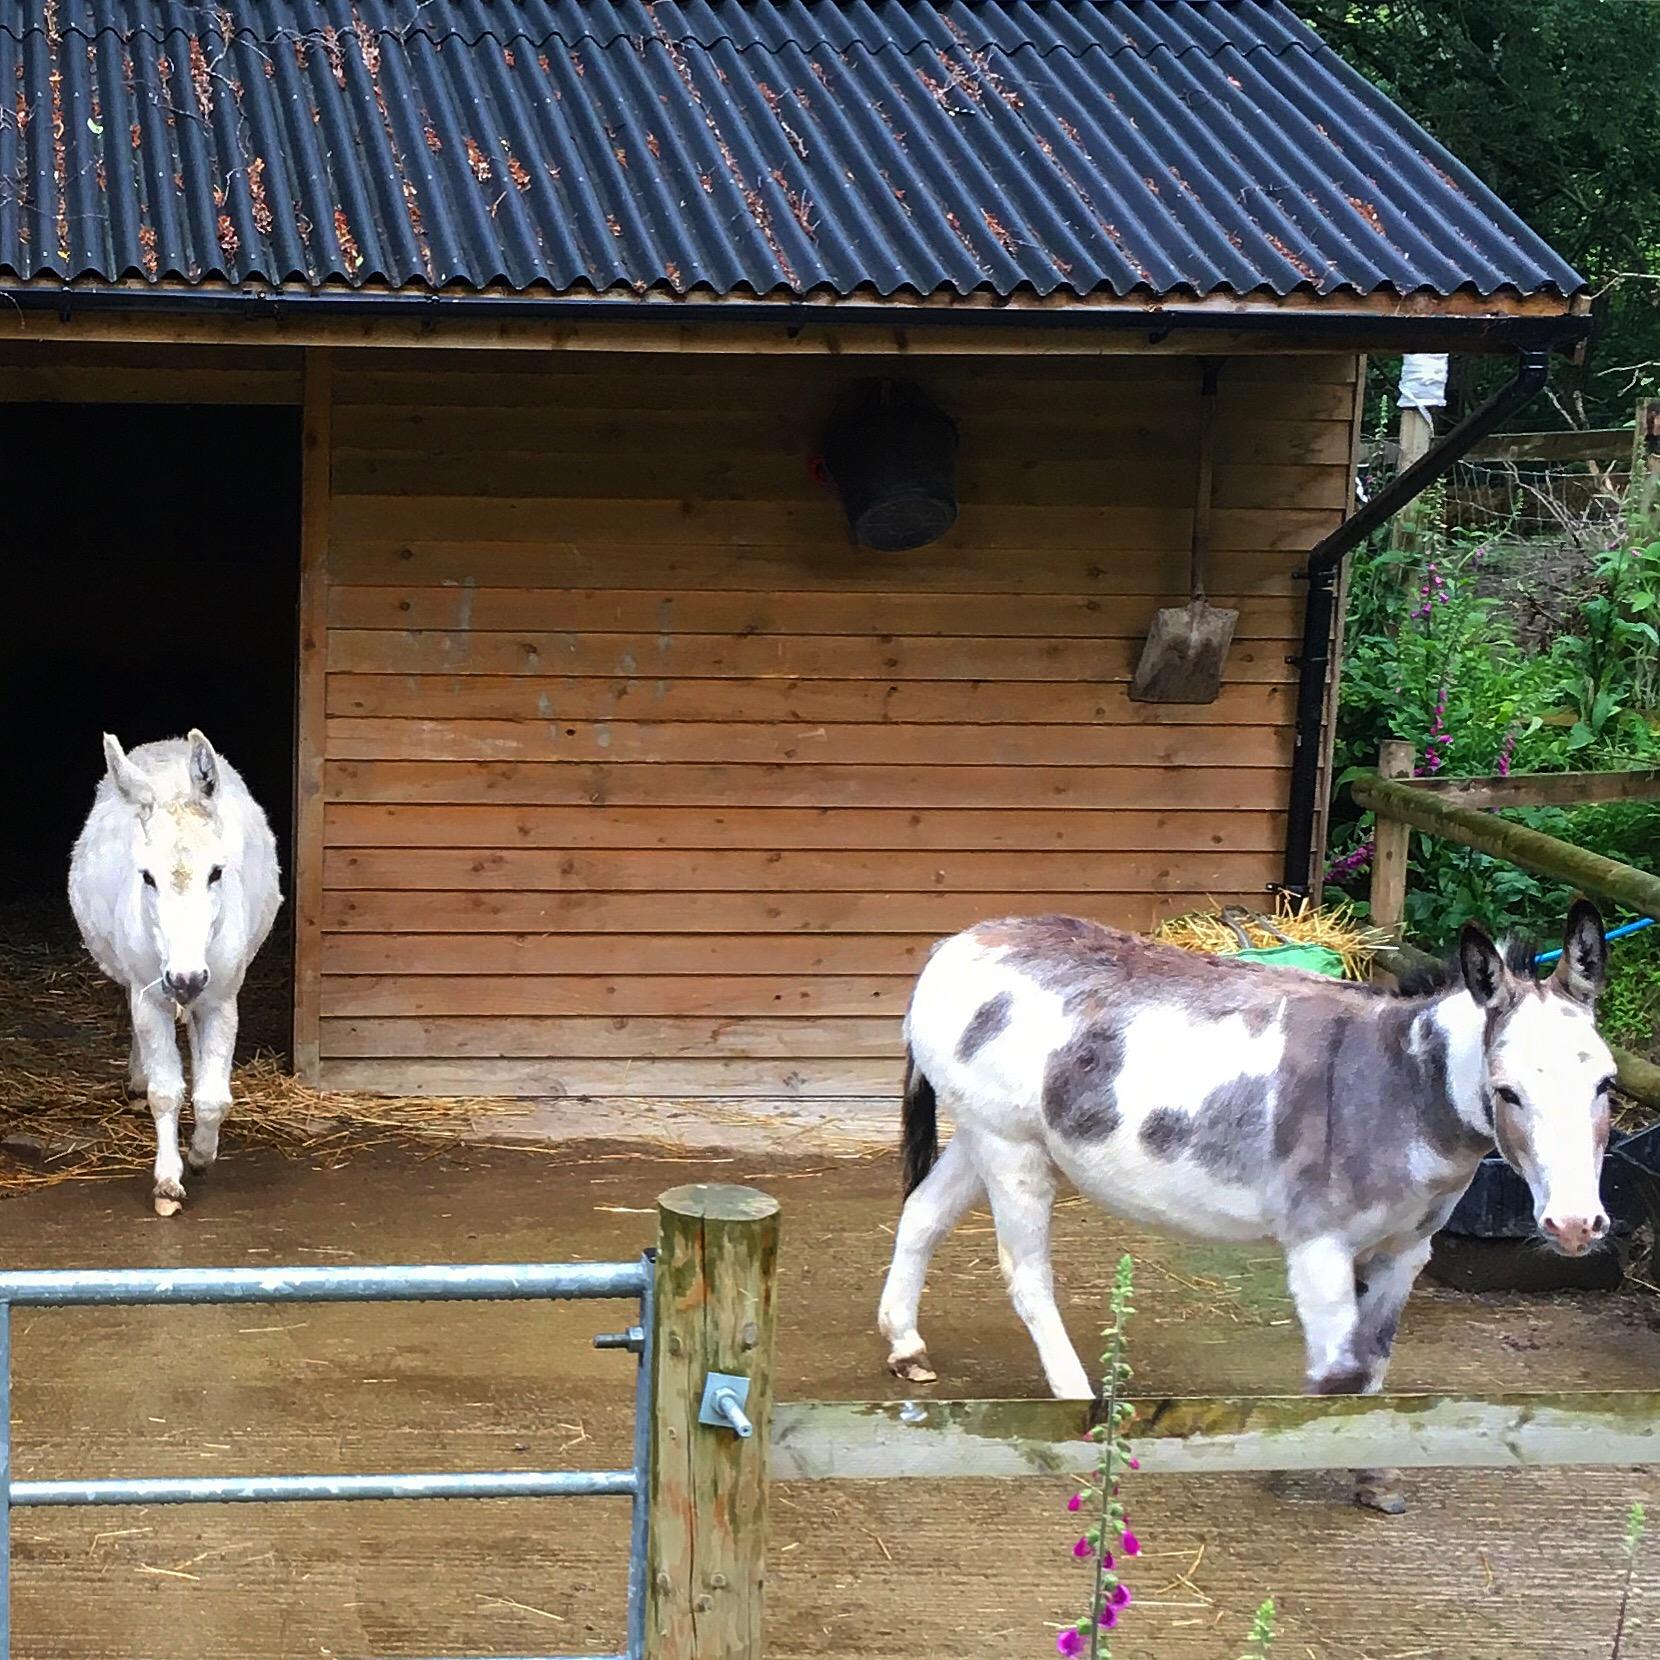 Visiting the donkeys